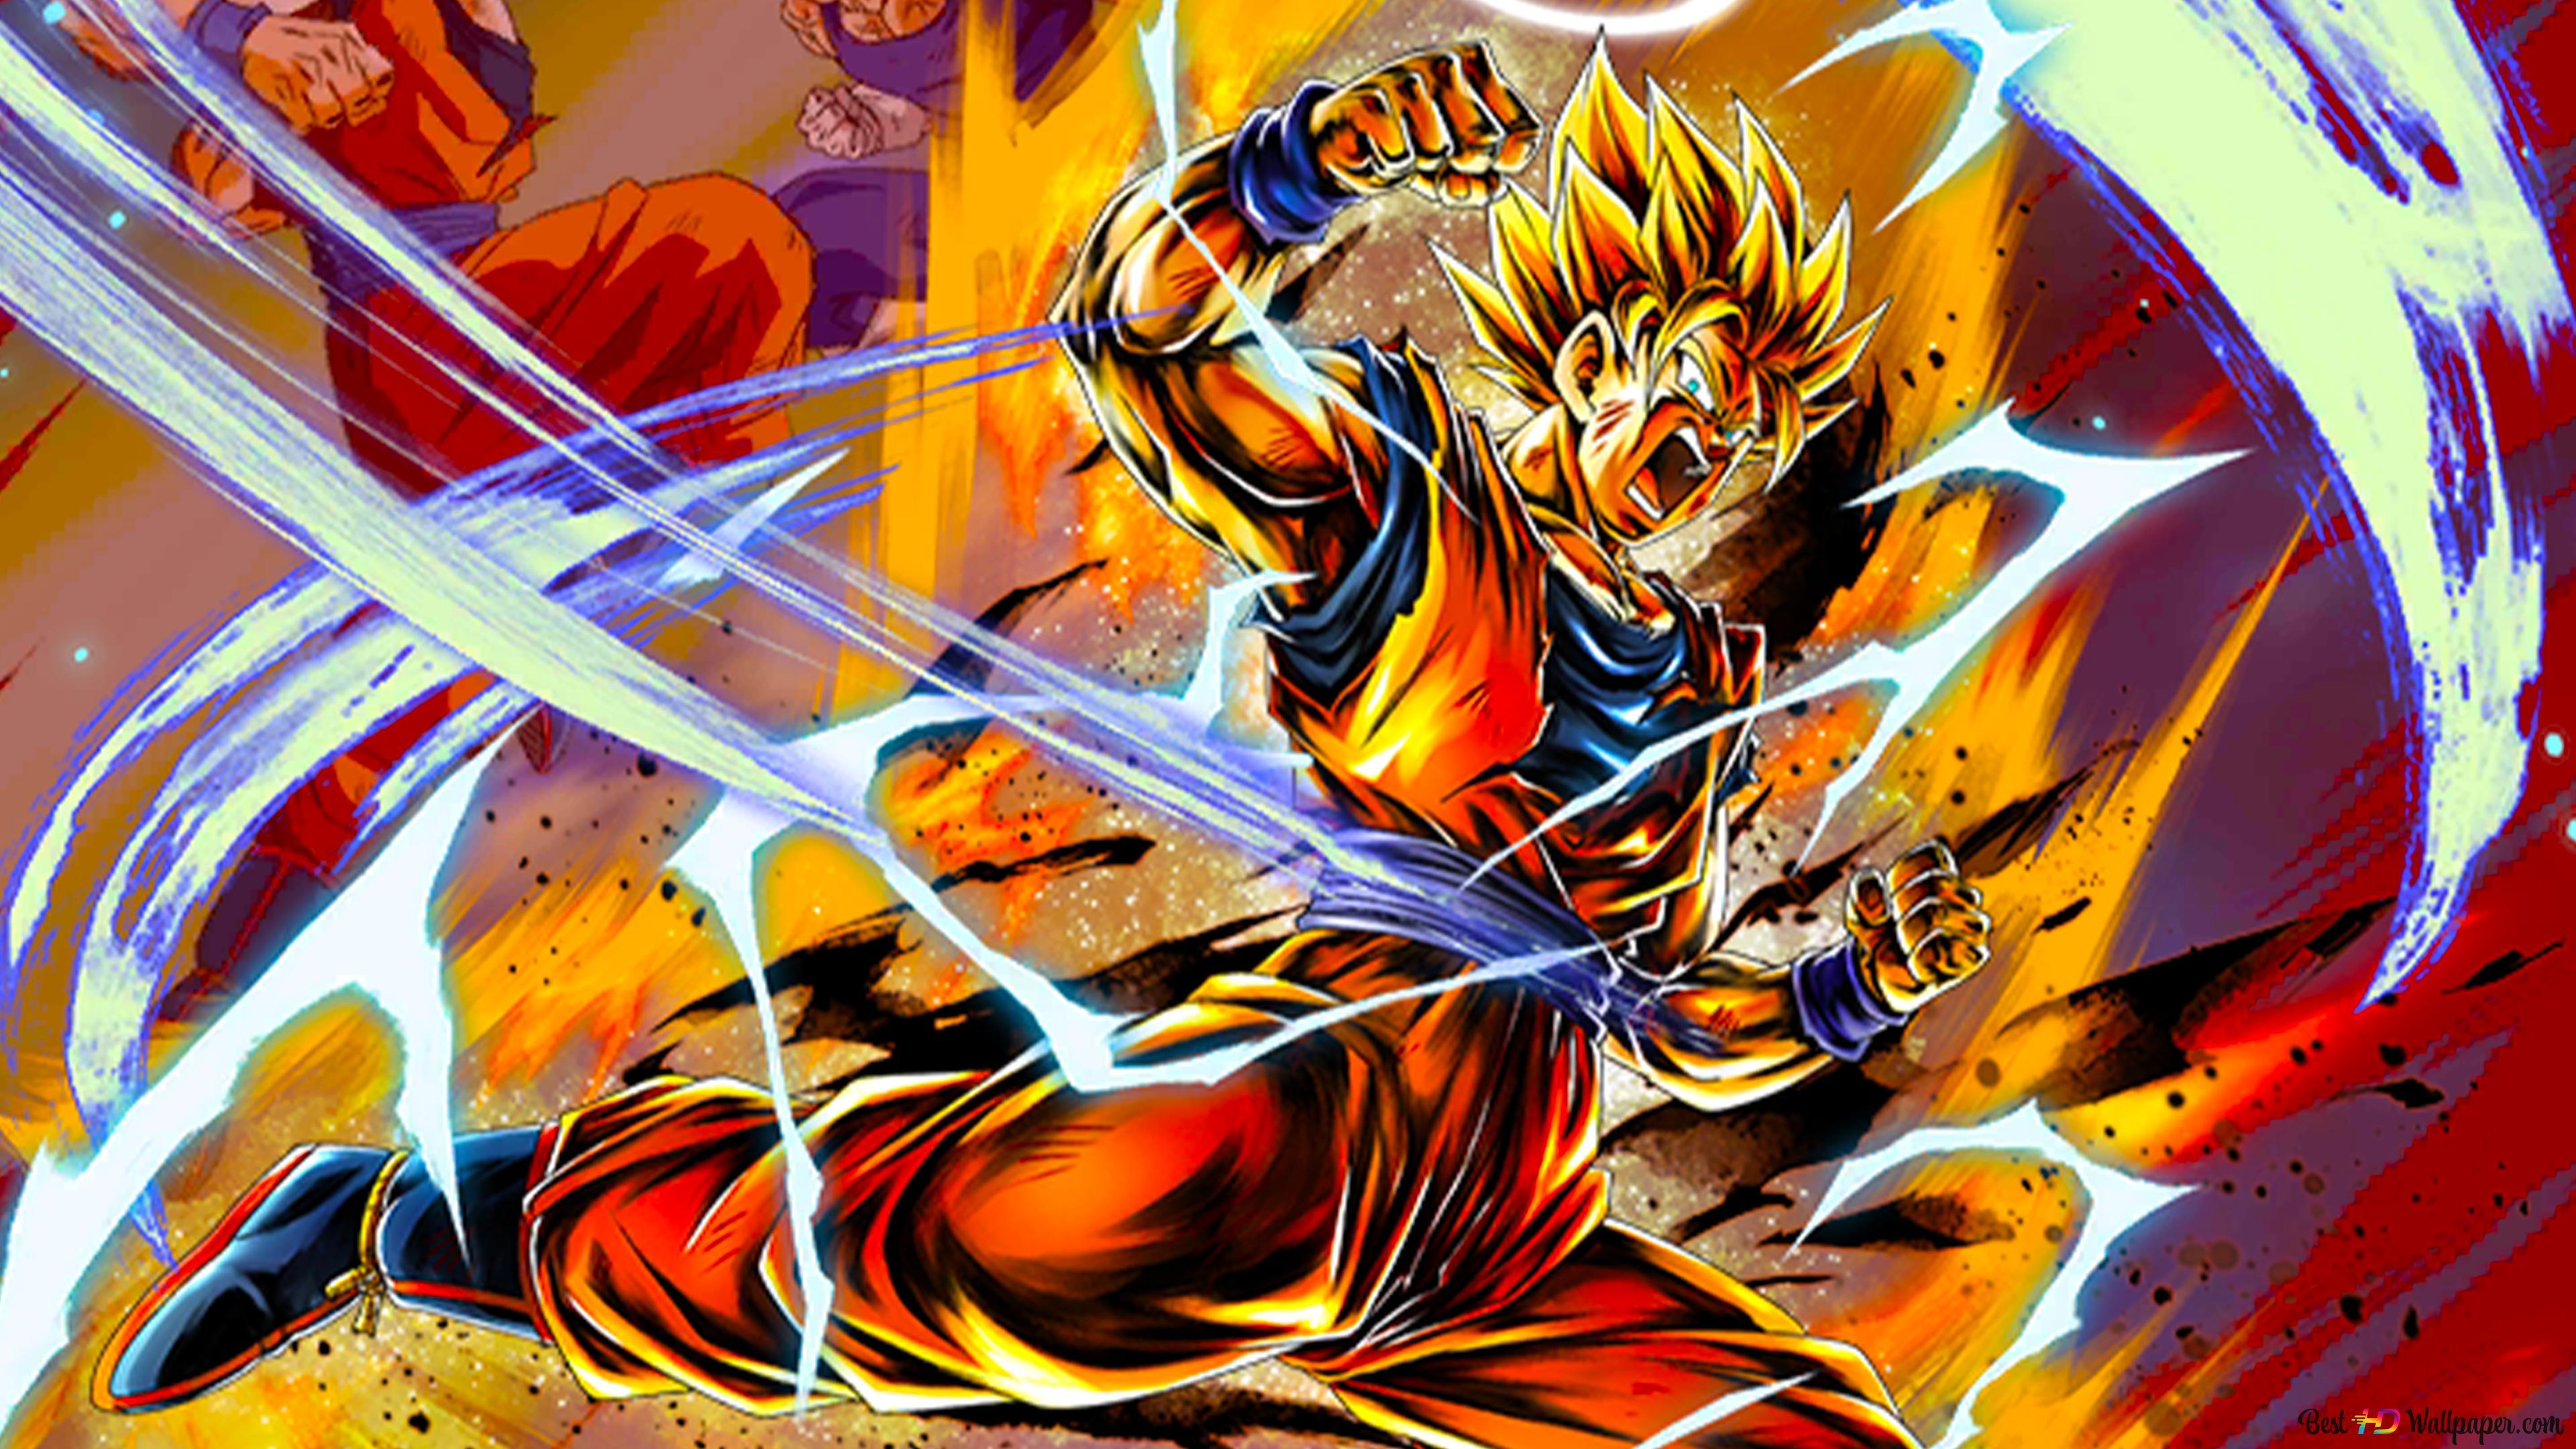 Super Saiyan 2 Goku Vs Majin Vegeta From Dragon Ball Z Dragon Ball Legends Arts For Desktop Hd Wallpaper Download